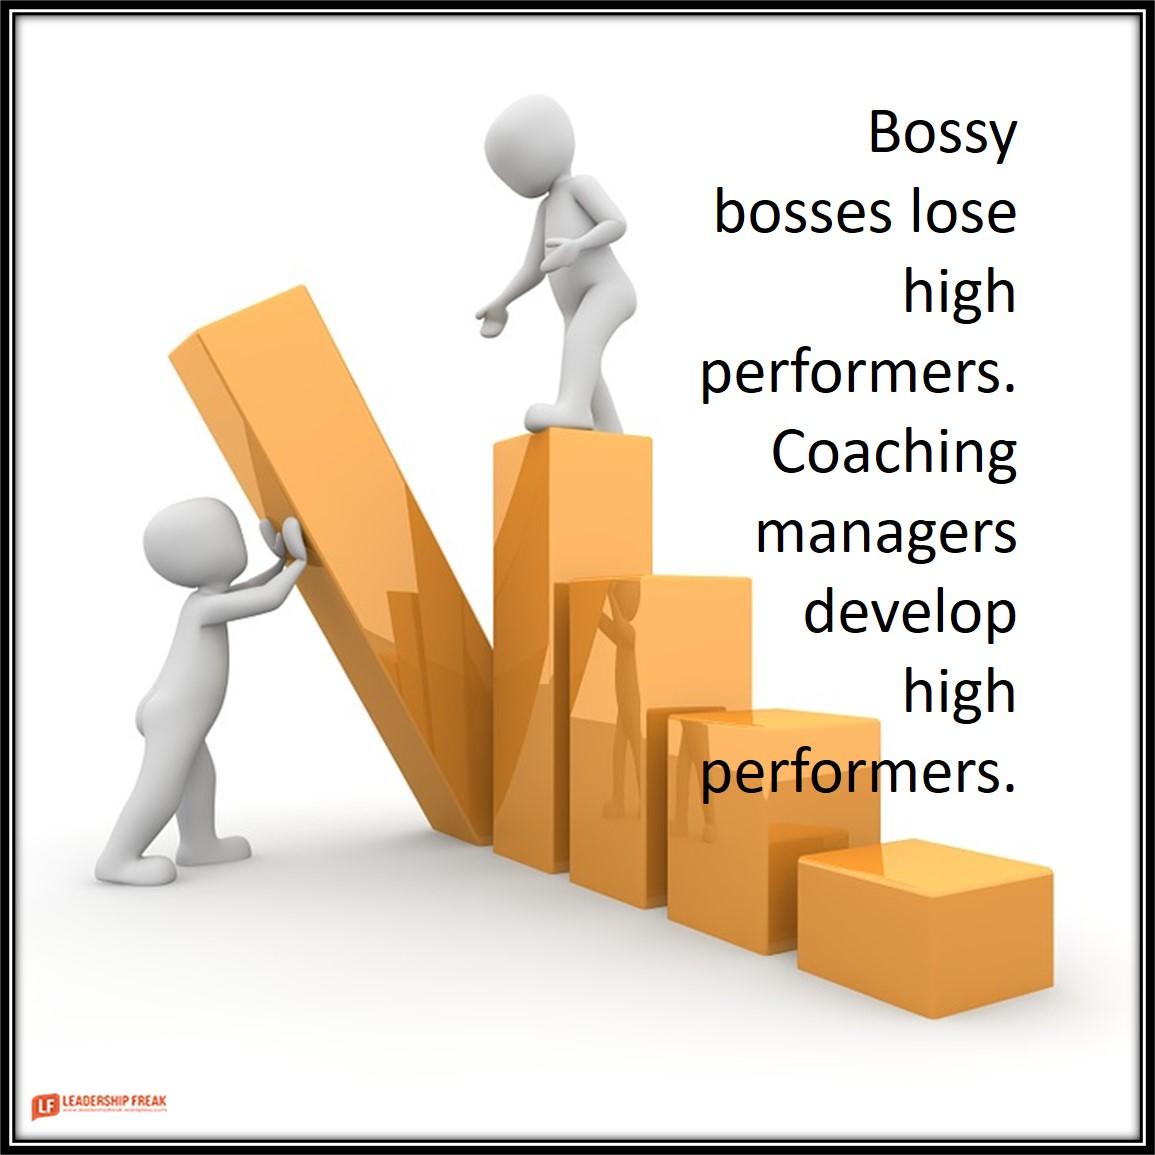 Development  Bossy bosses lose high performers. Coaching managers develop high performers.